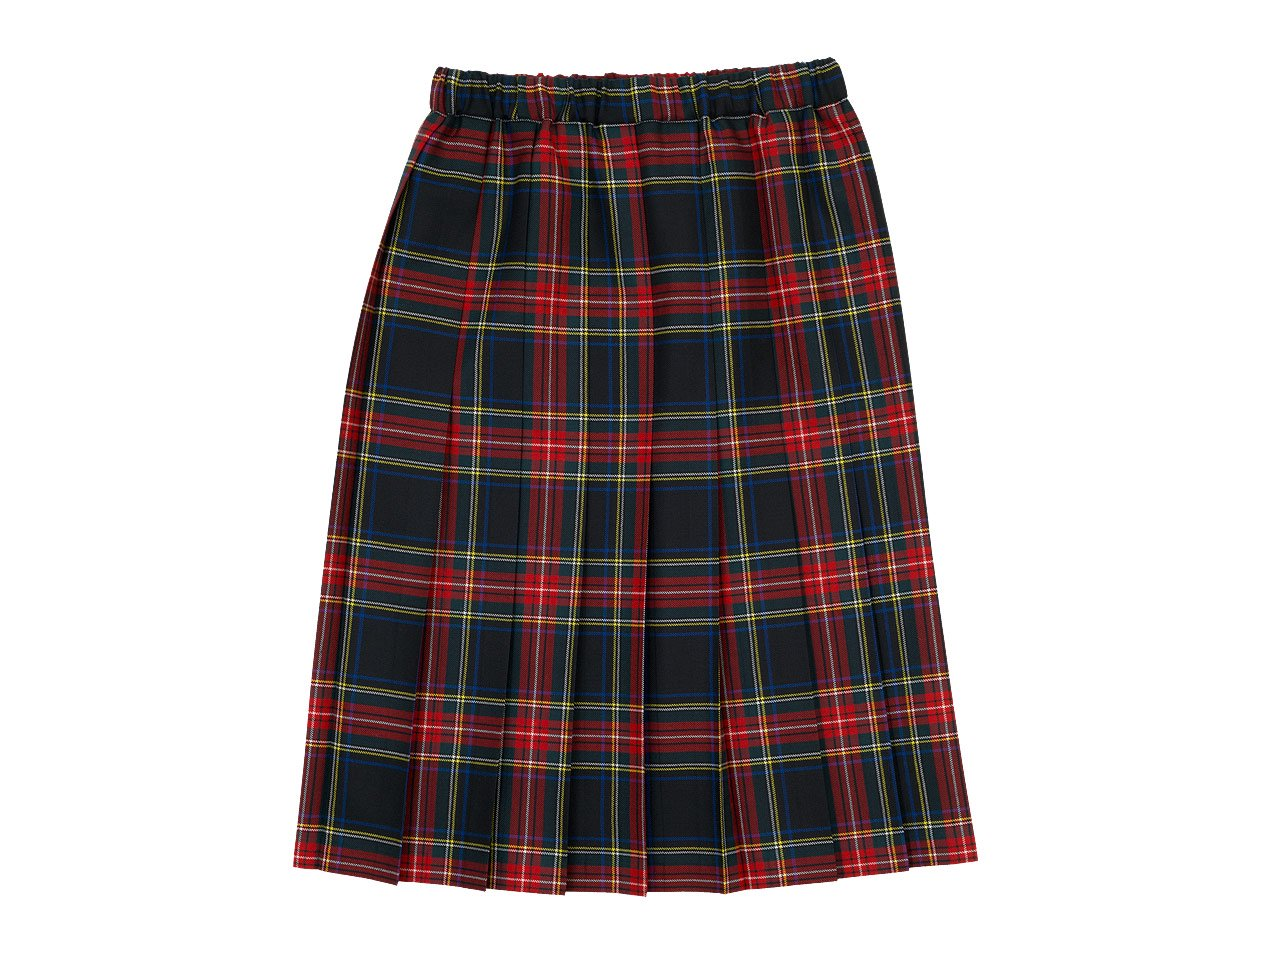 Charpentier de Vaisseau Bona O'neil of Dublin プリーツスカート RED x BLACK CHECK